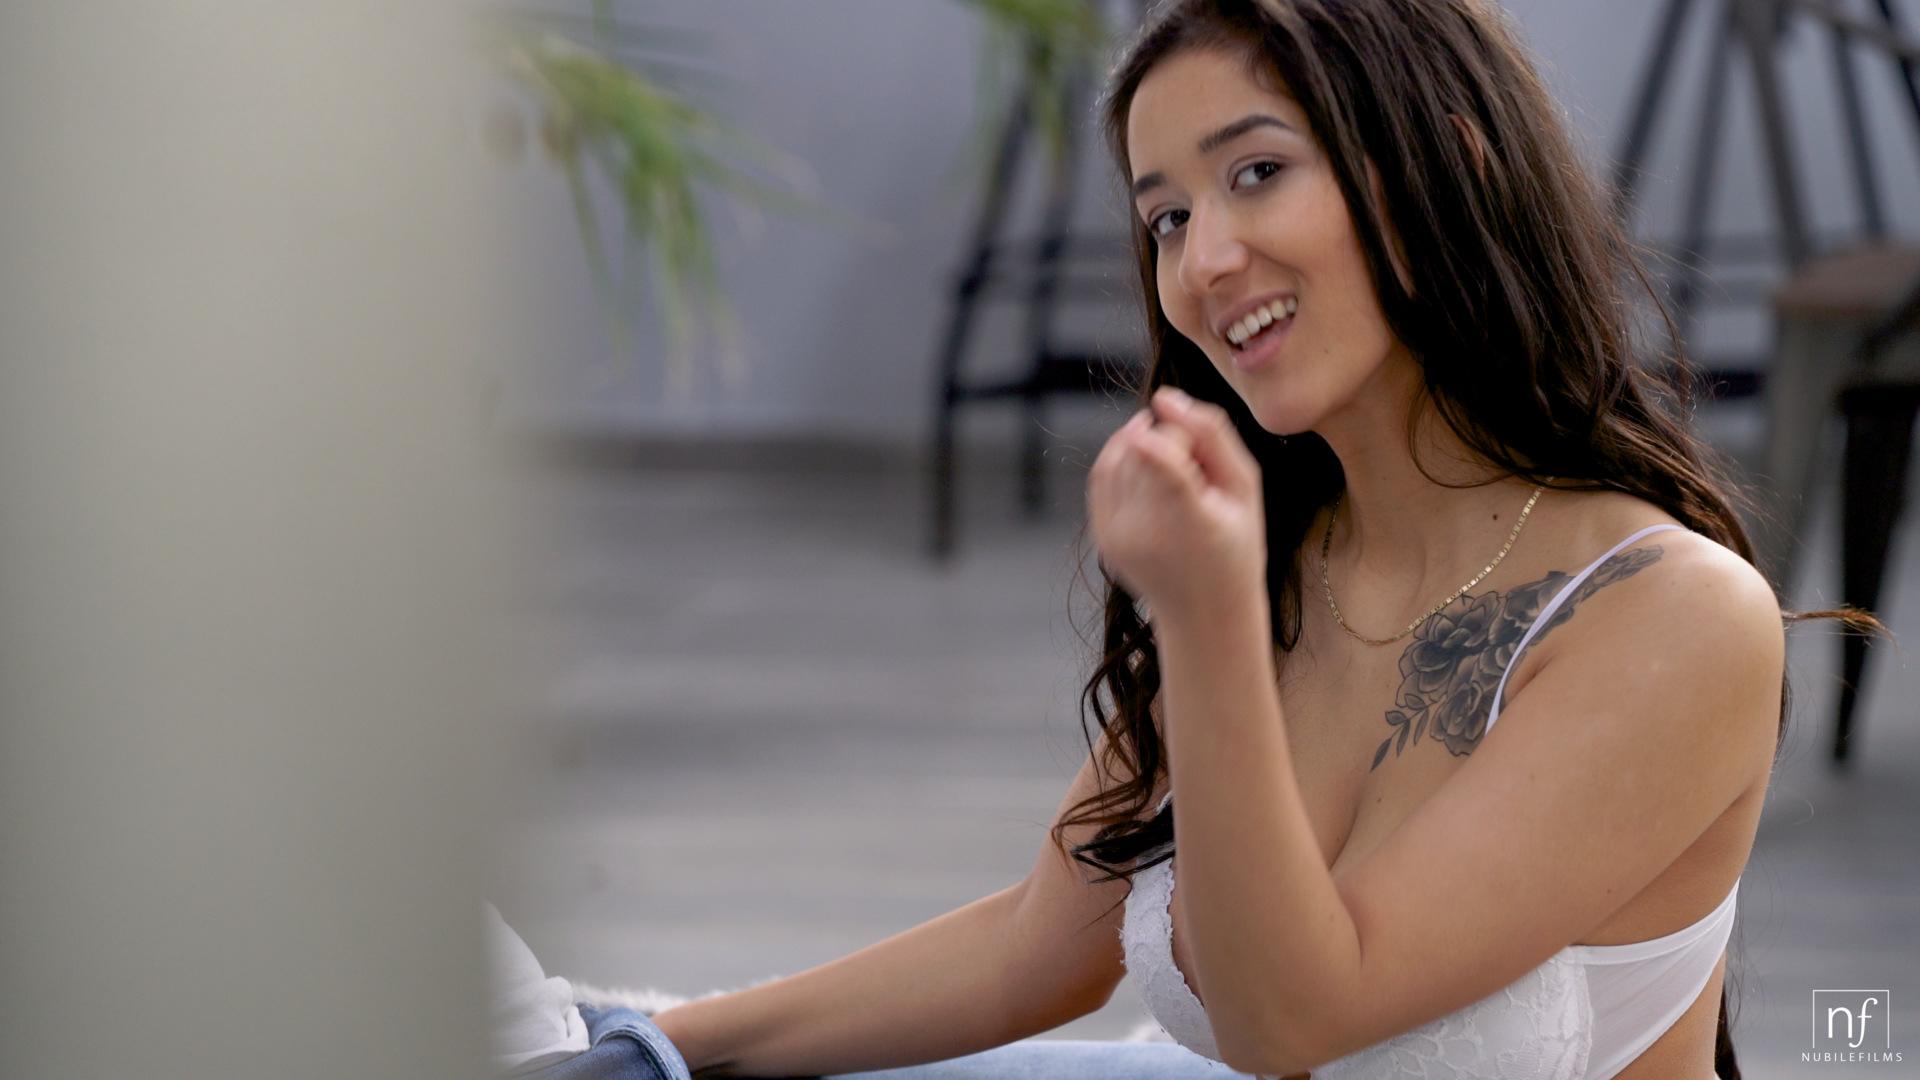 NubileFilms.com - Darcia Lee,Nesty,Renato: Lovers And Friends - S32:E1